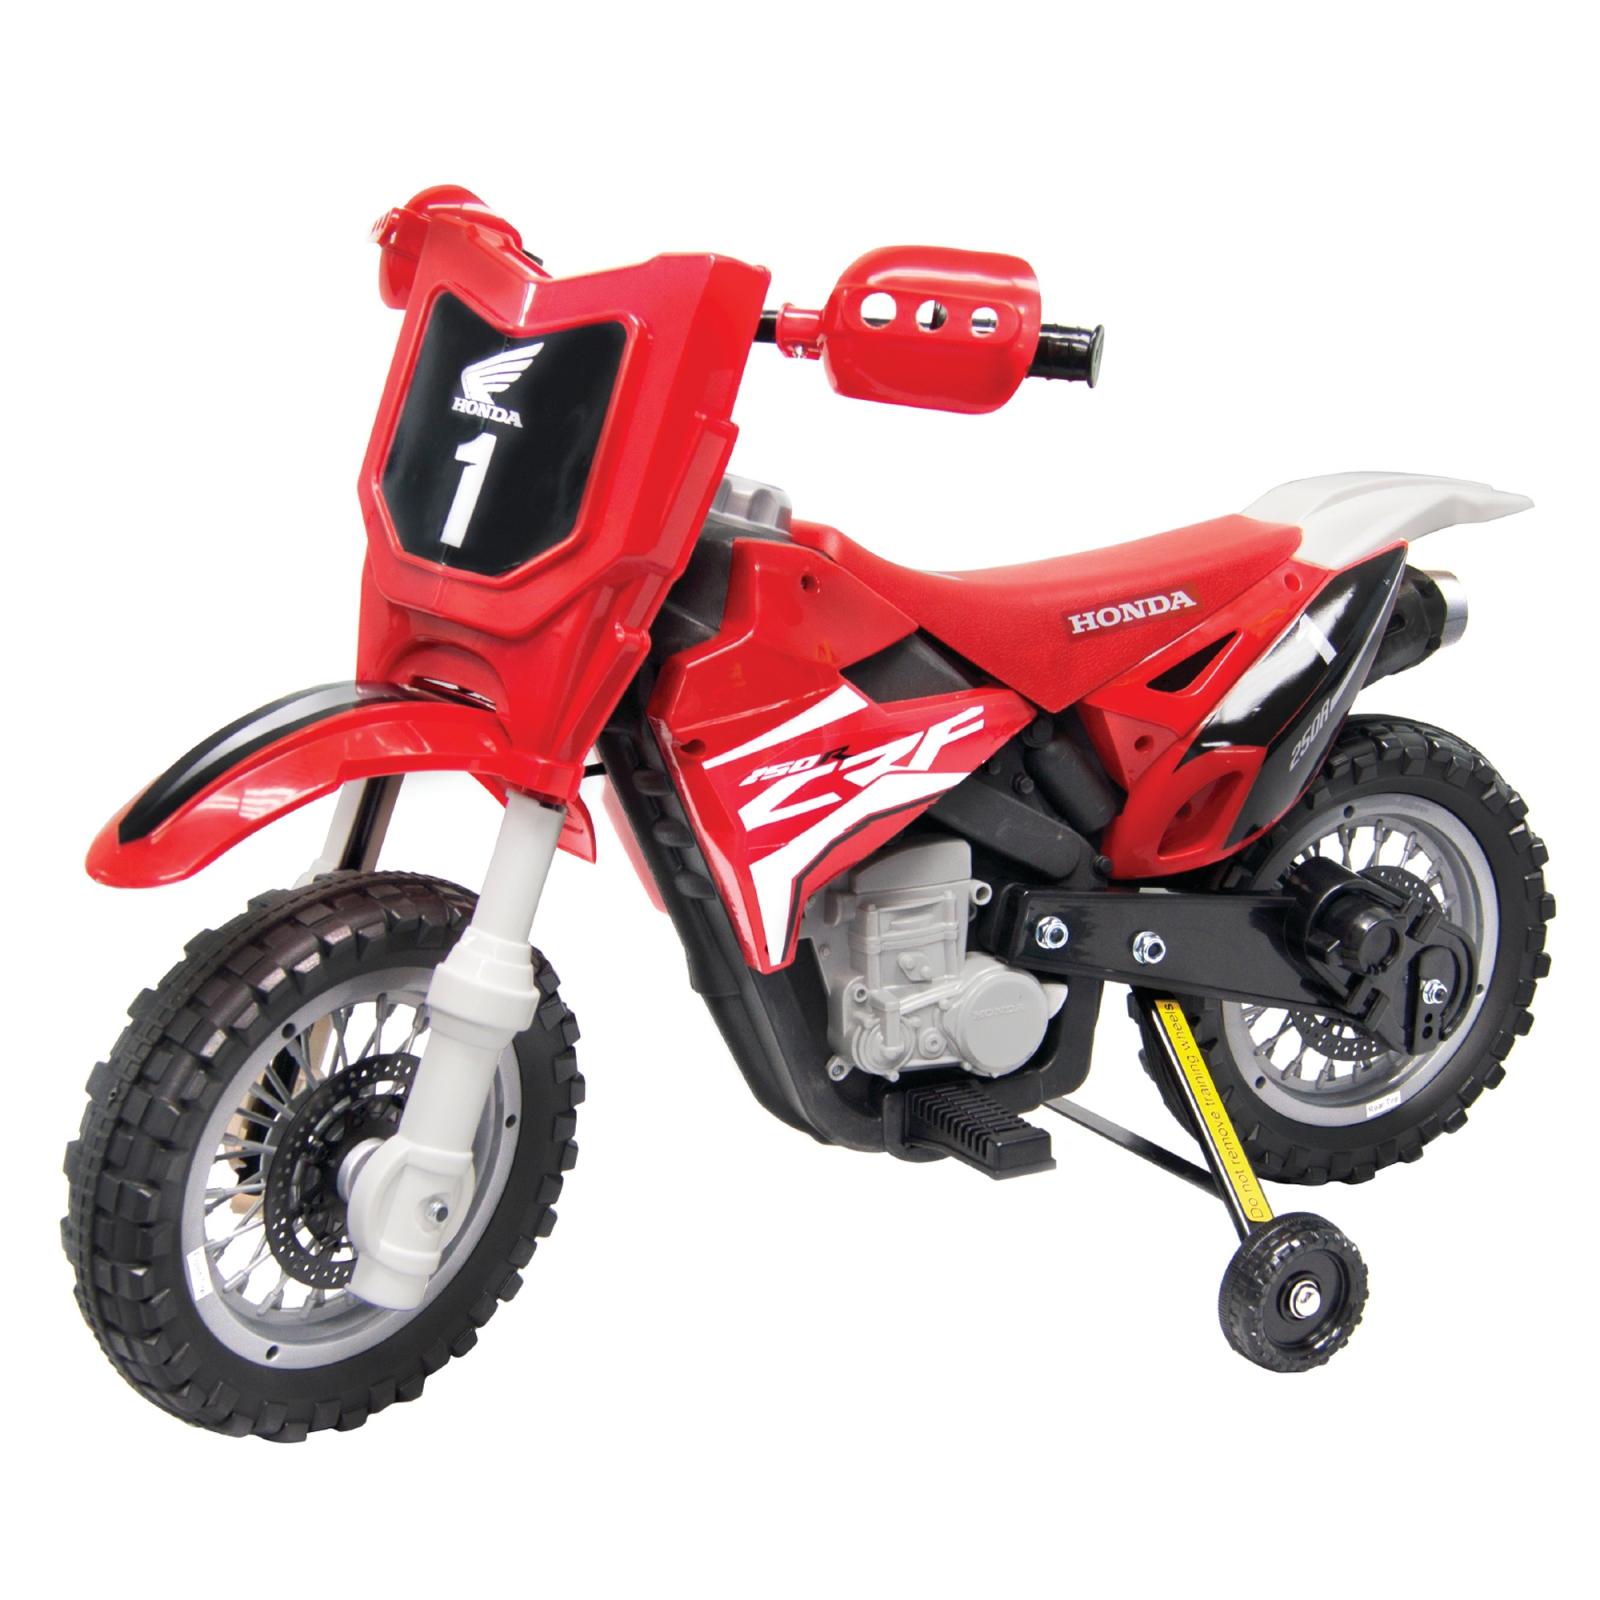 Official Licensed Honda CRF250R 6V Battery Powered Kids Ride On Dirt Bike Red